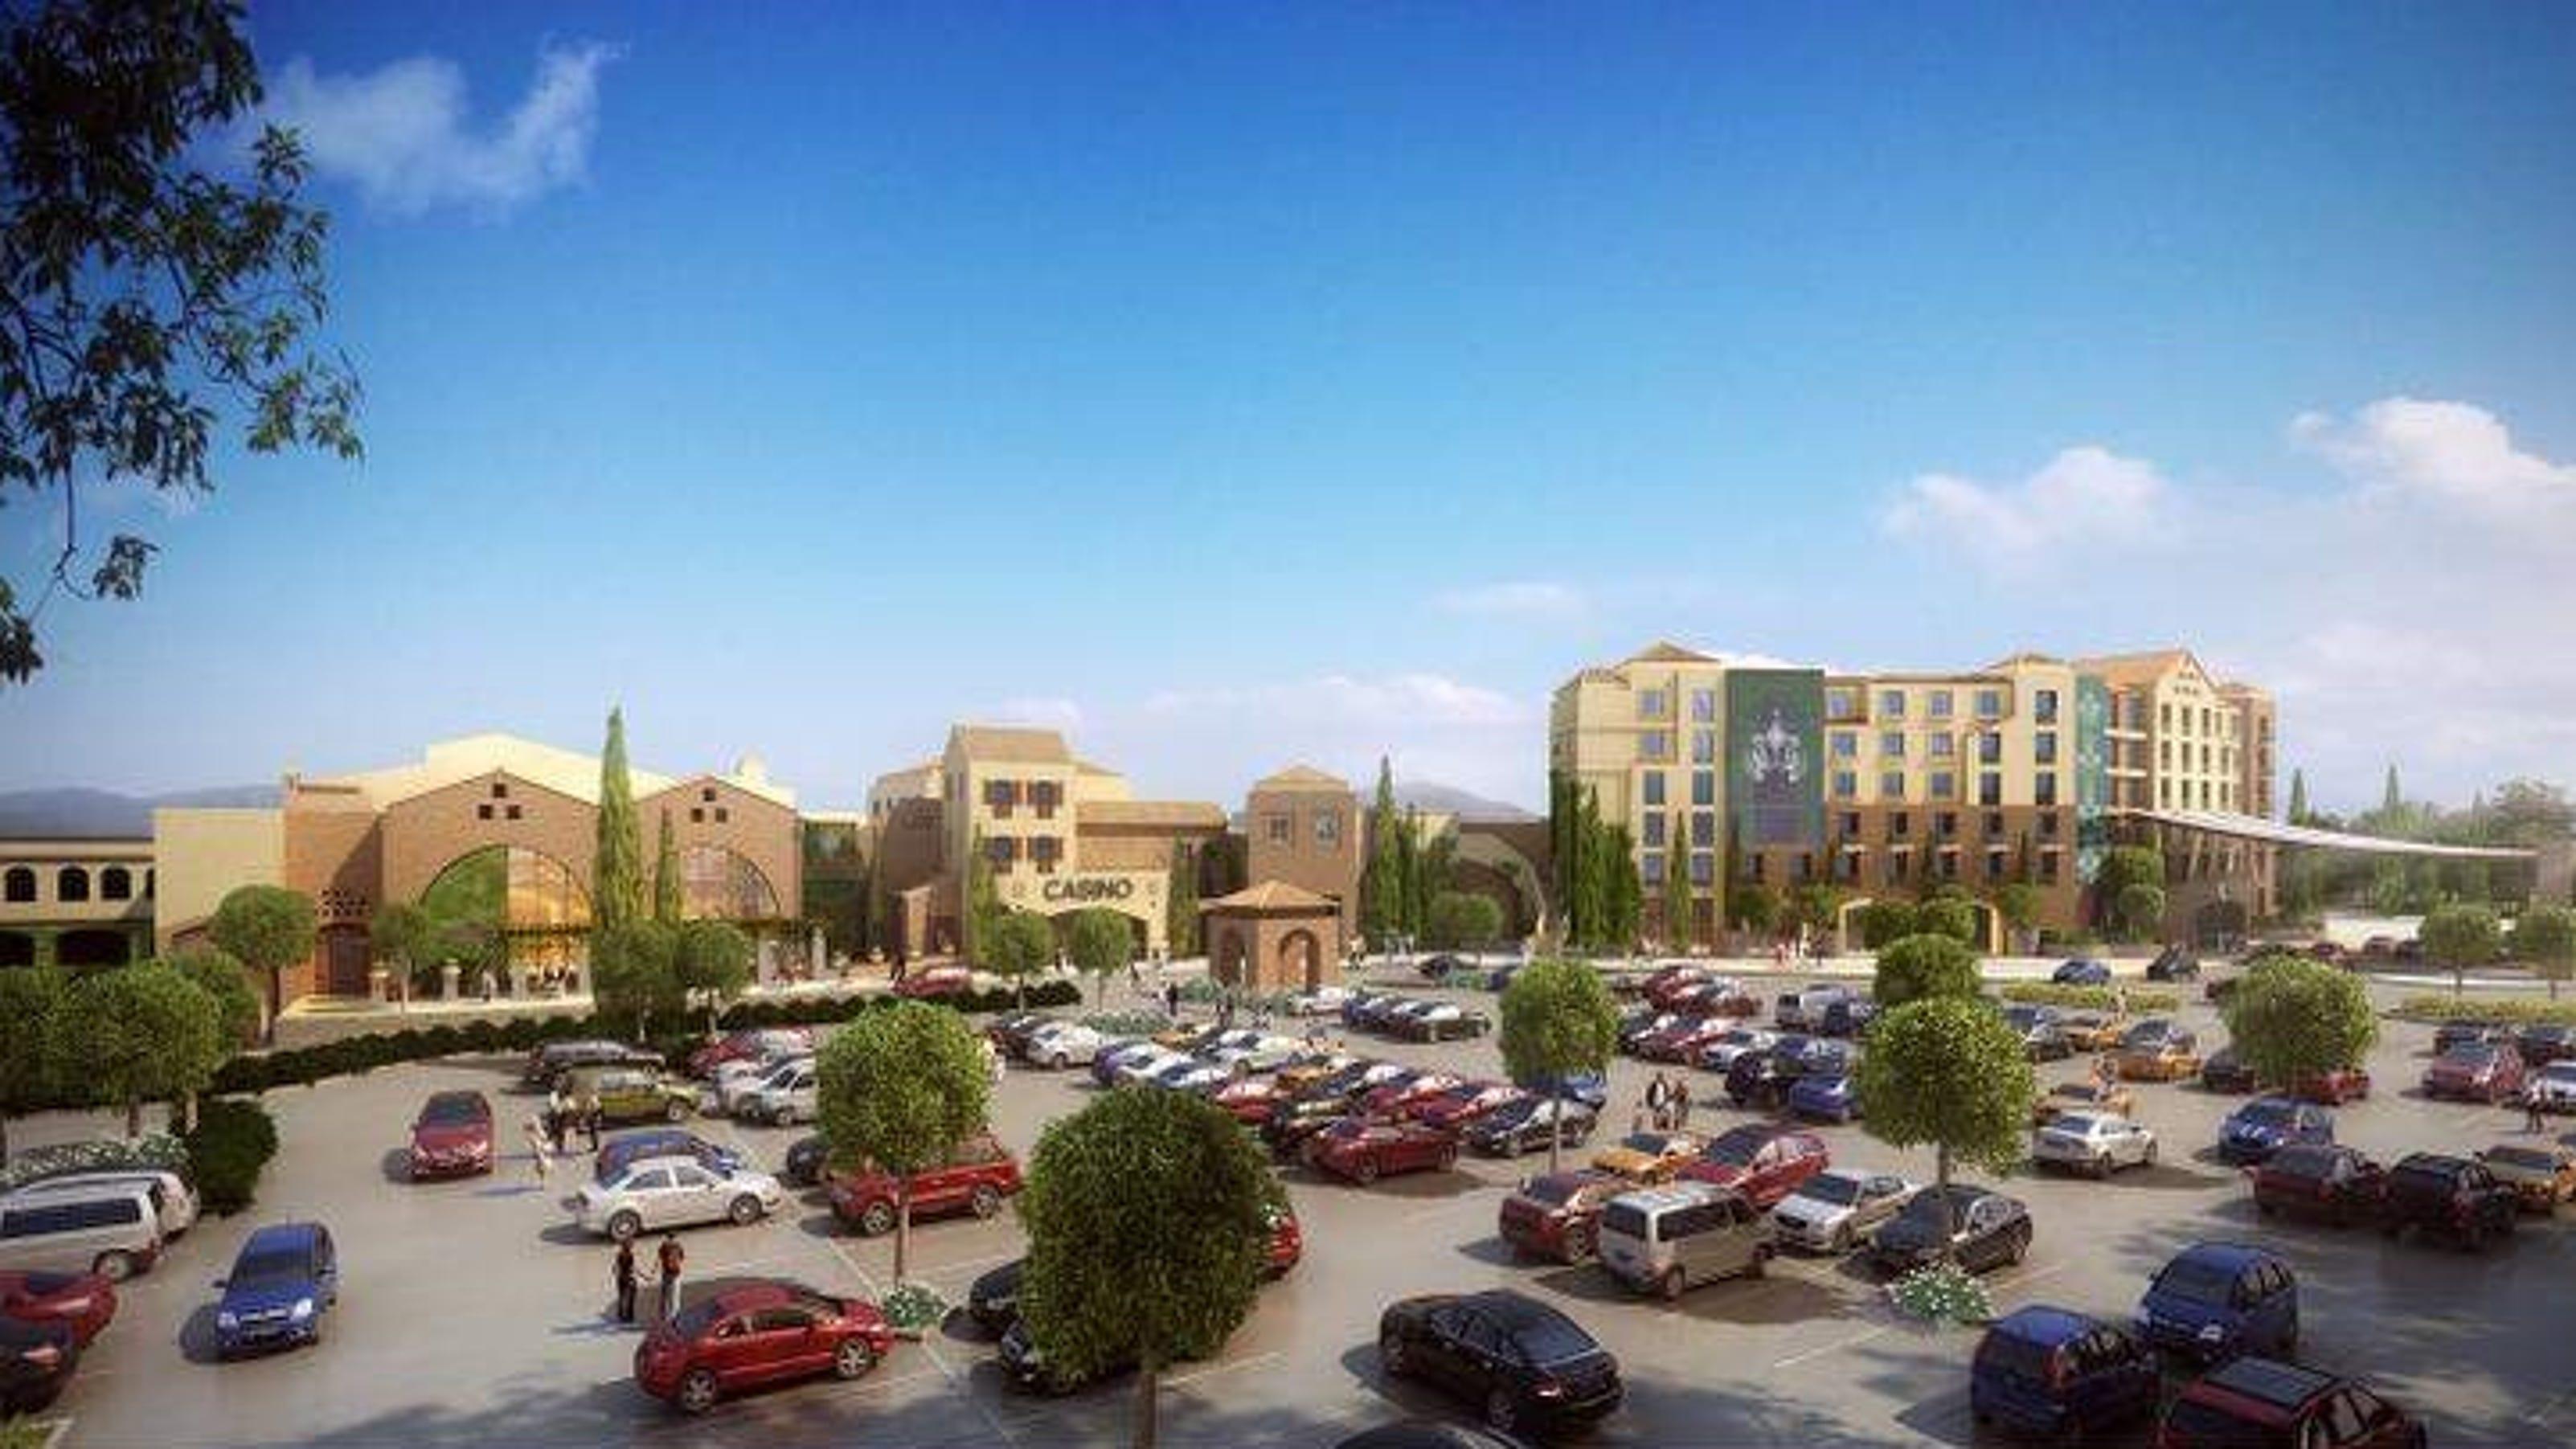 Tyre casino proposal